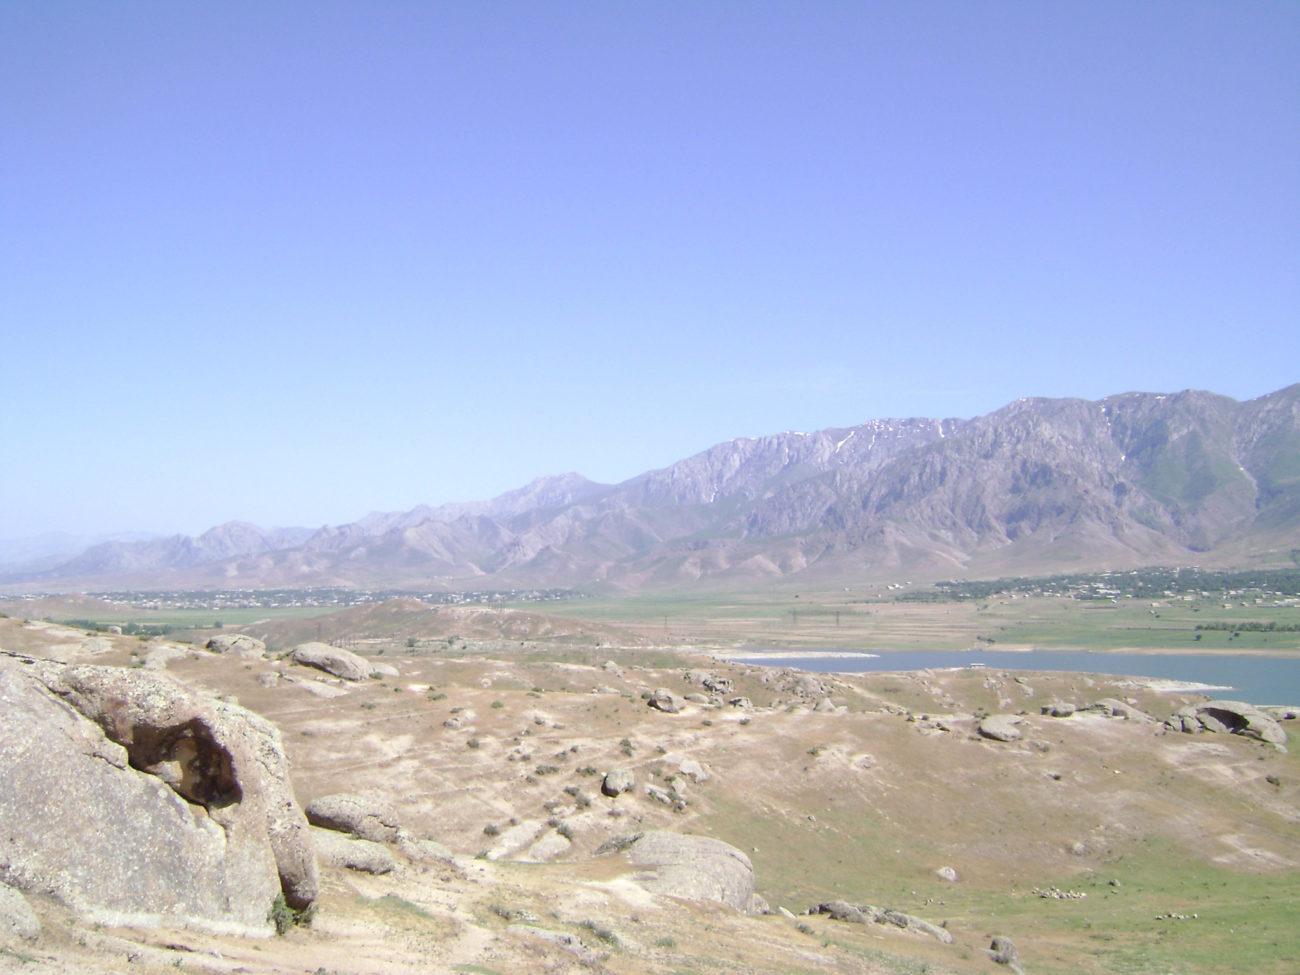 Zeravchan Rivière Ouzbékistan Tarie Environnement Koundouzak